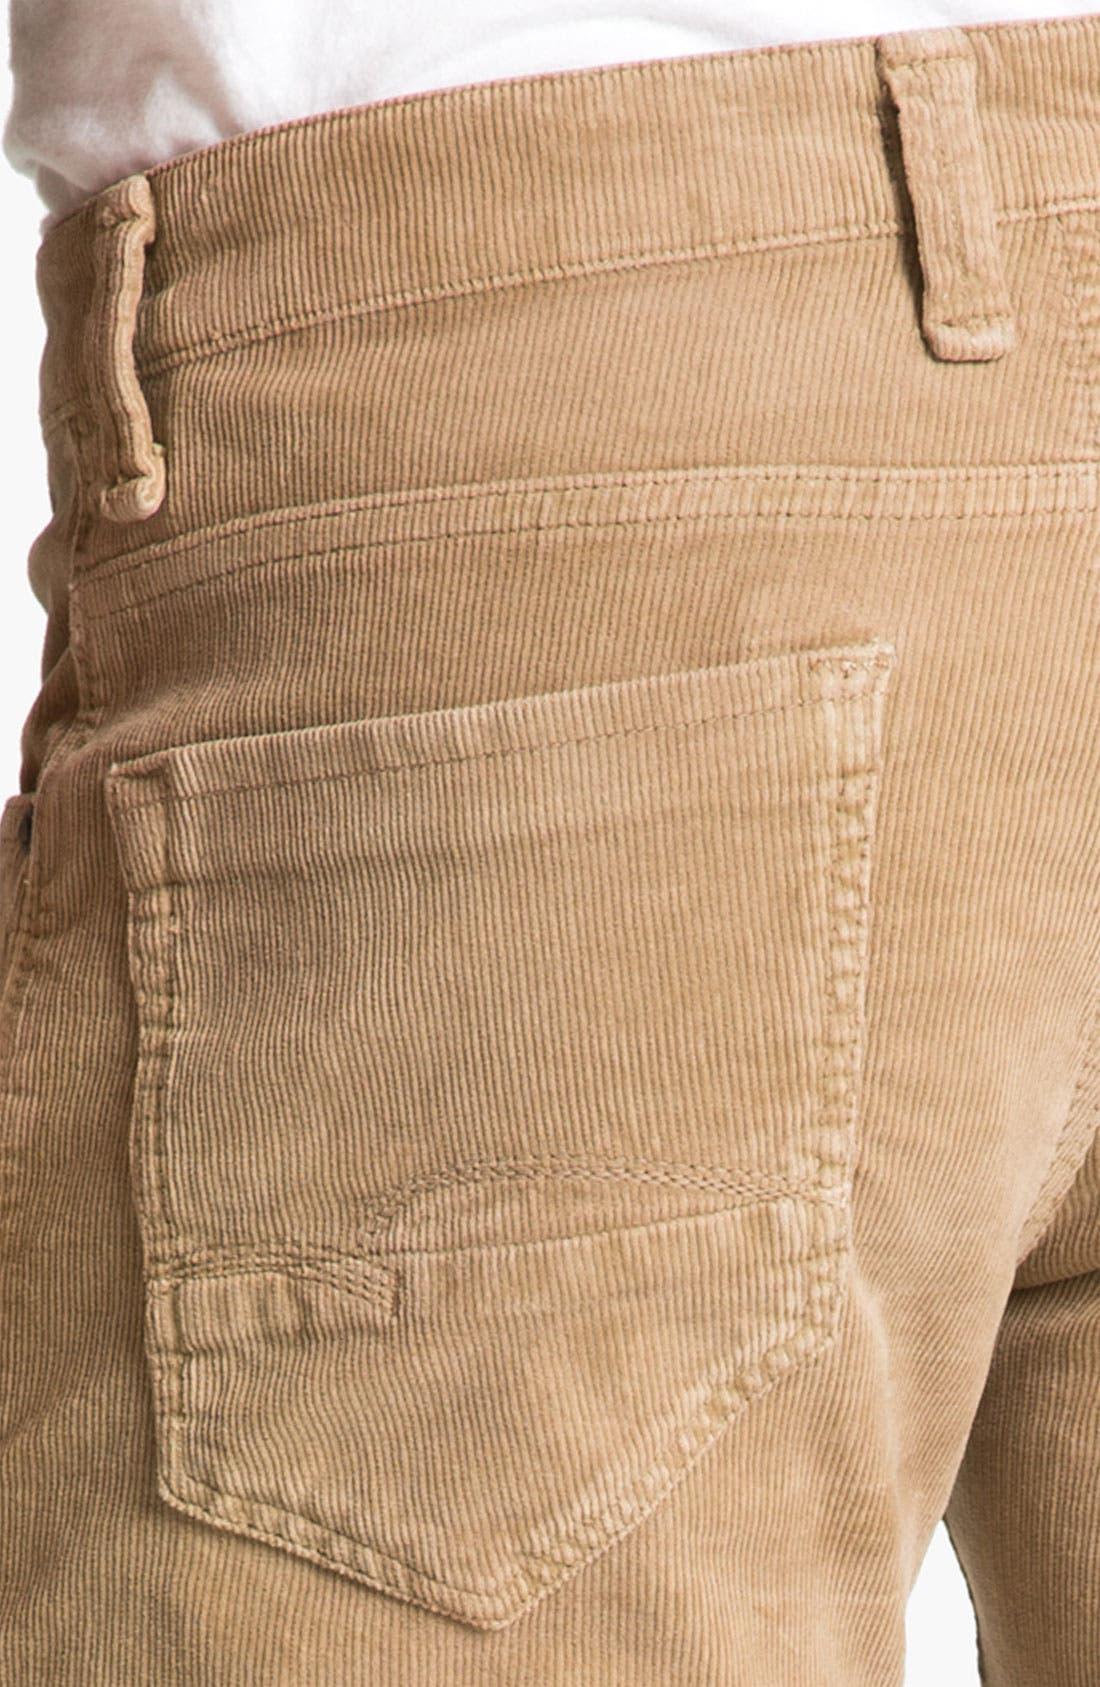 Alternate Image 3  - Mavi Jeans 'Zach' Straight Leg Corduroy Pants